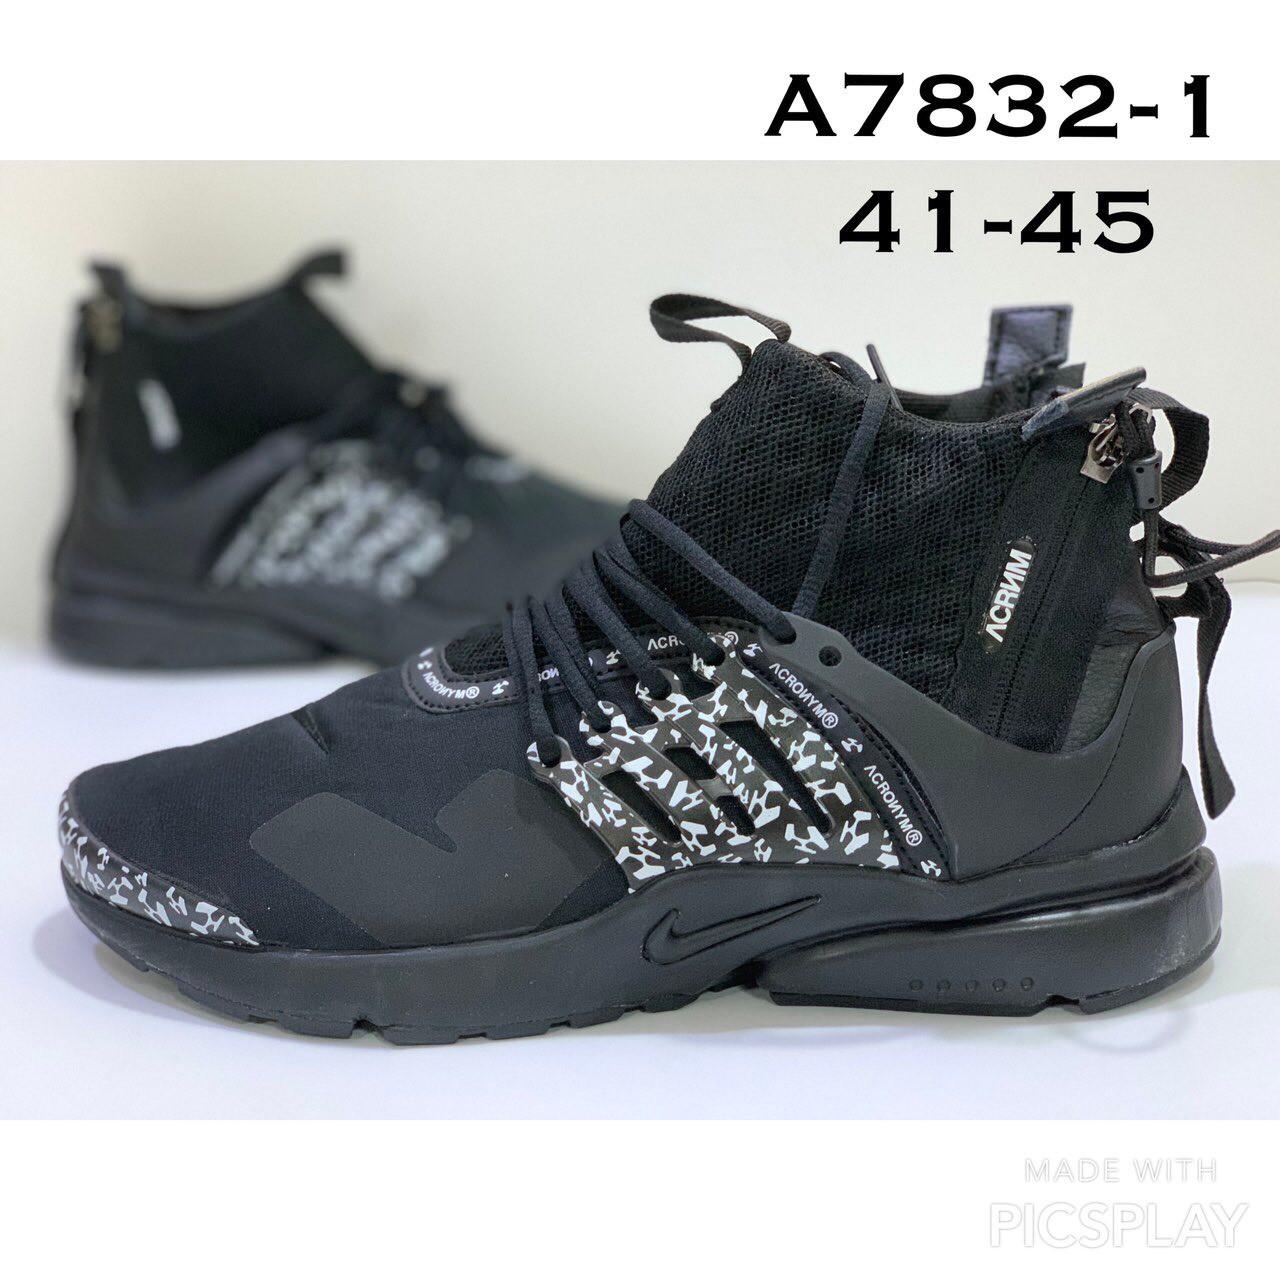 Мужские кроссовки Nike Presto Acronym оптом (41-45)